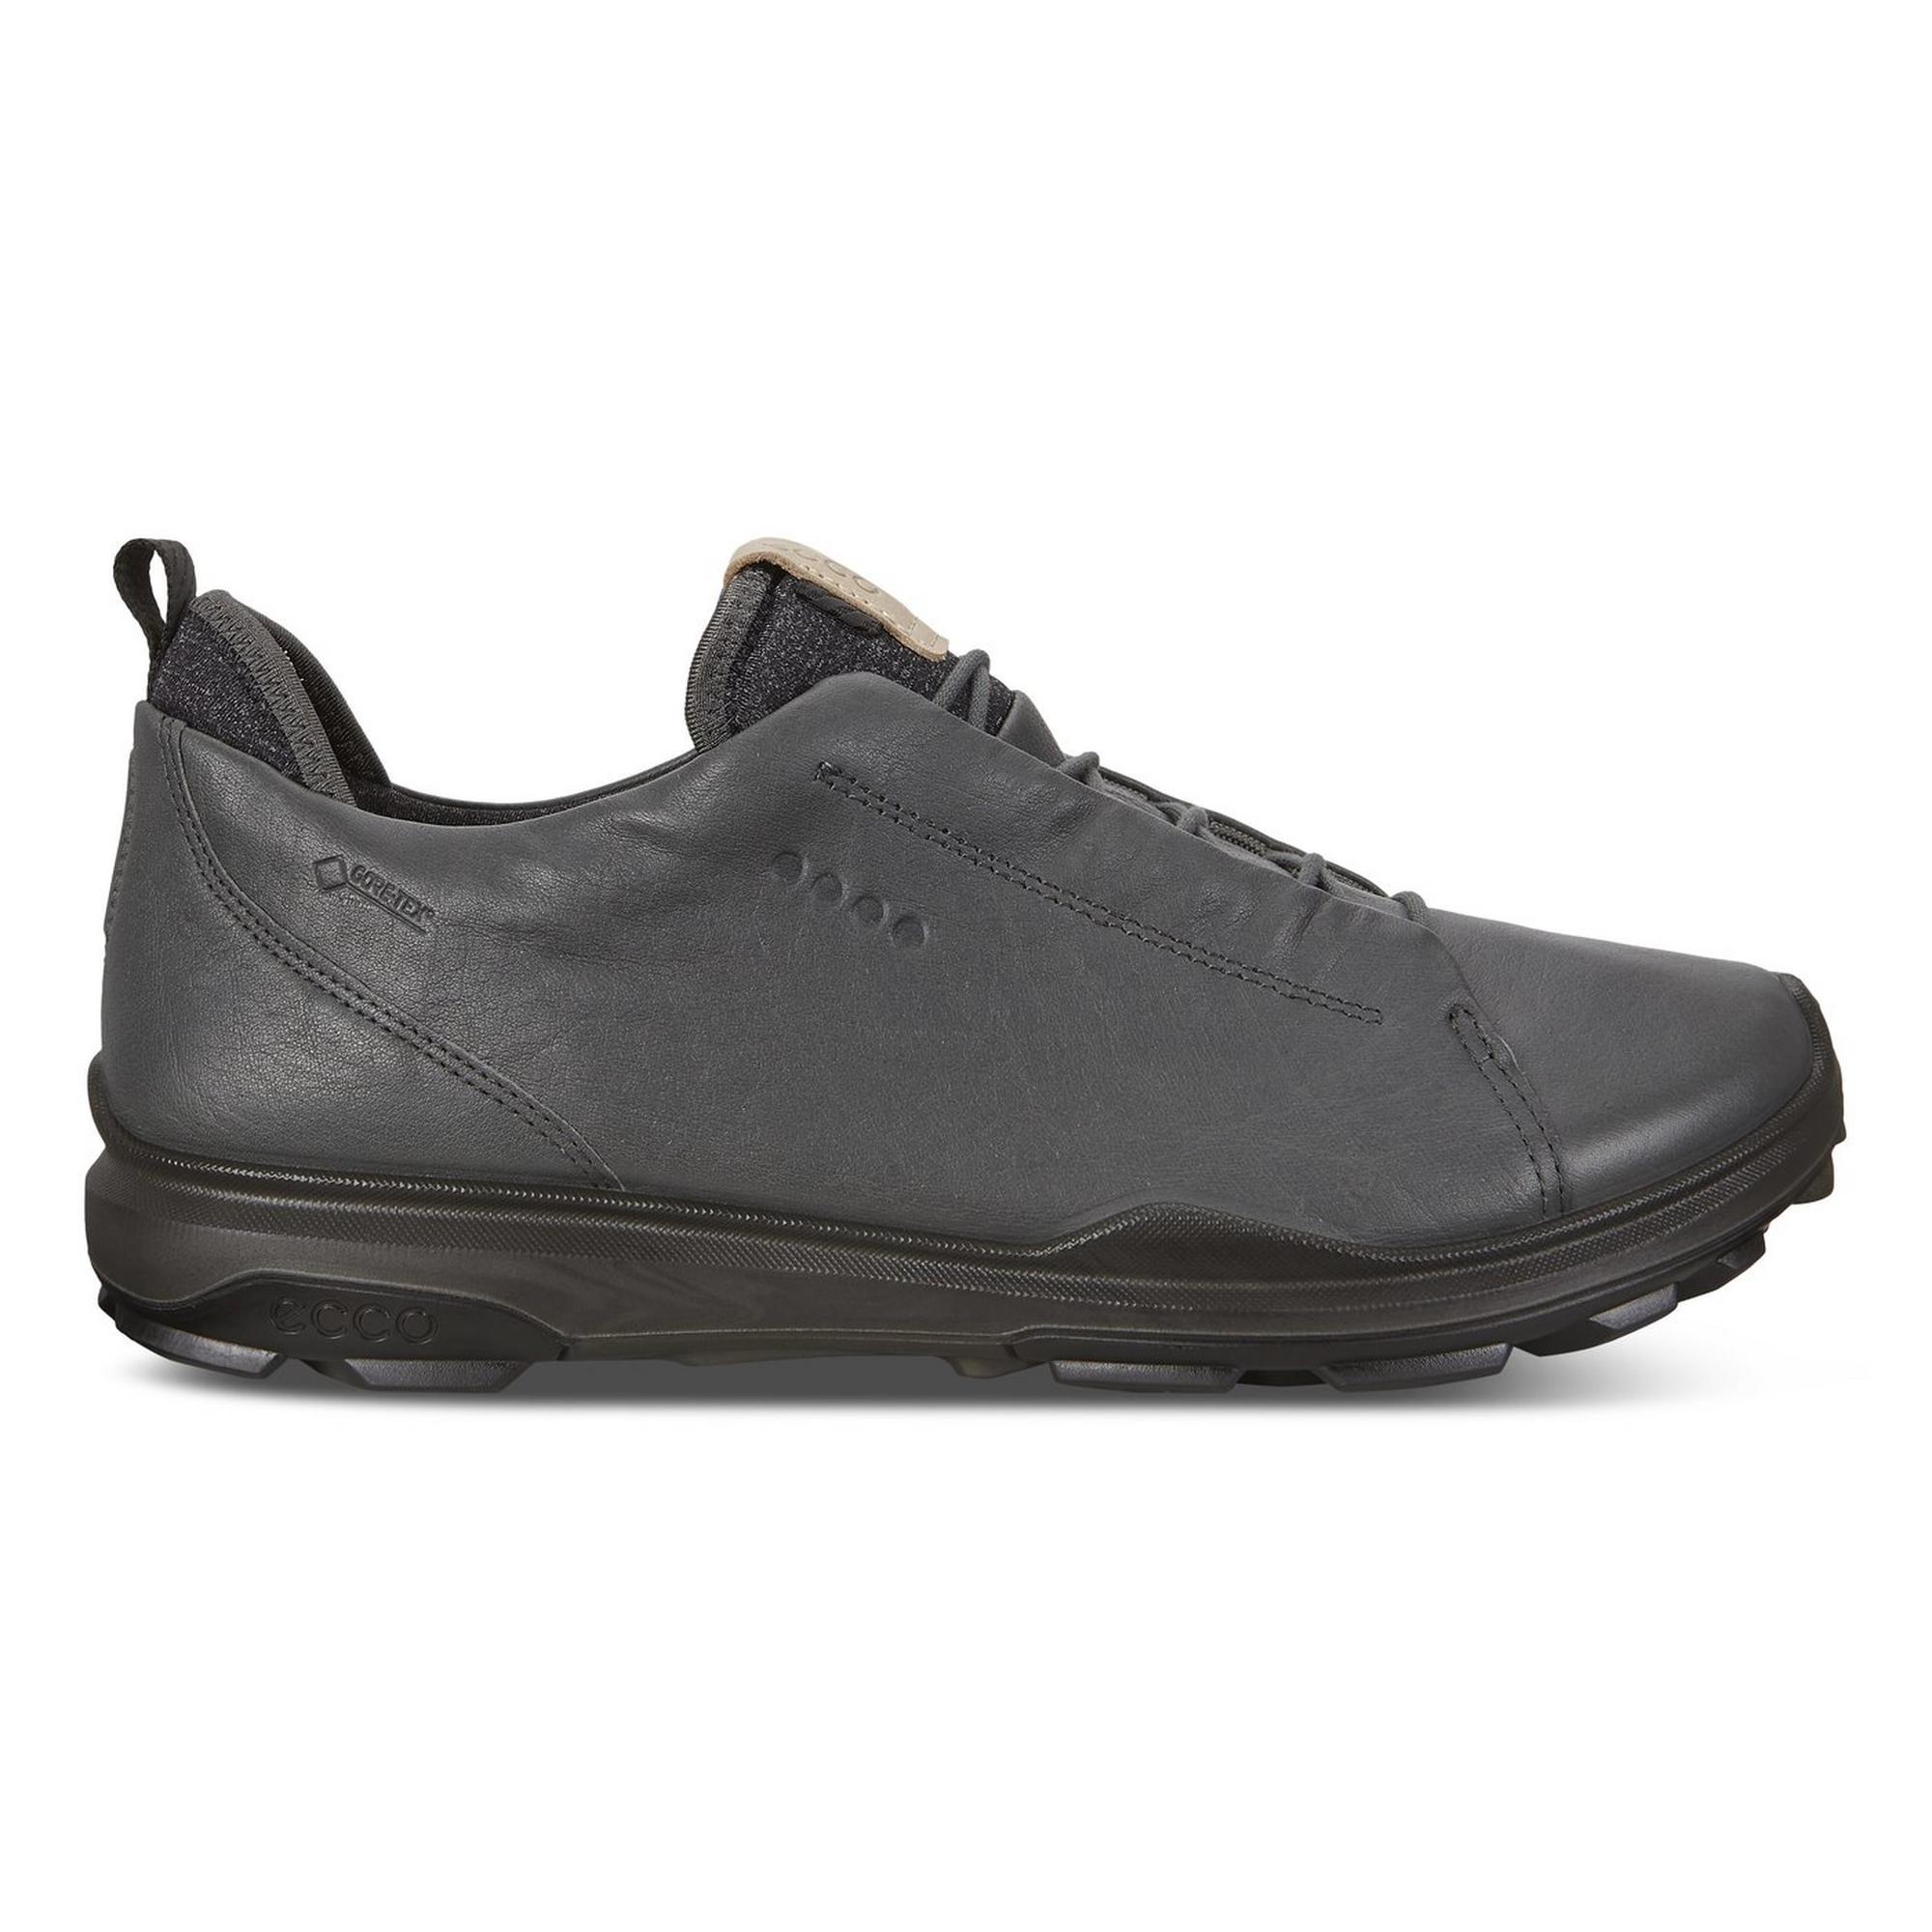 Men's Goretex Biom Hybrid 3 Recessed Lace Spikeless Golf Shoe - DARK GREY